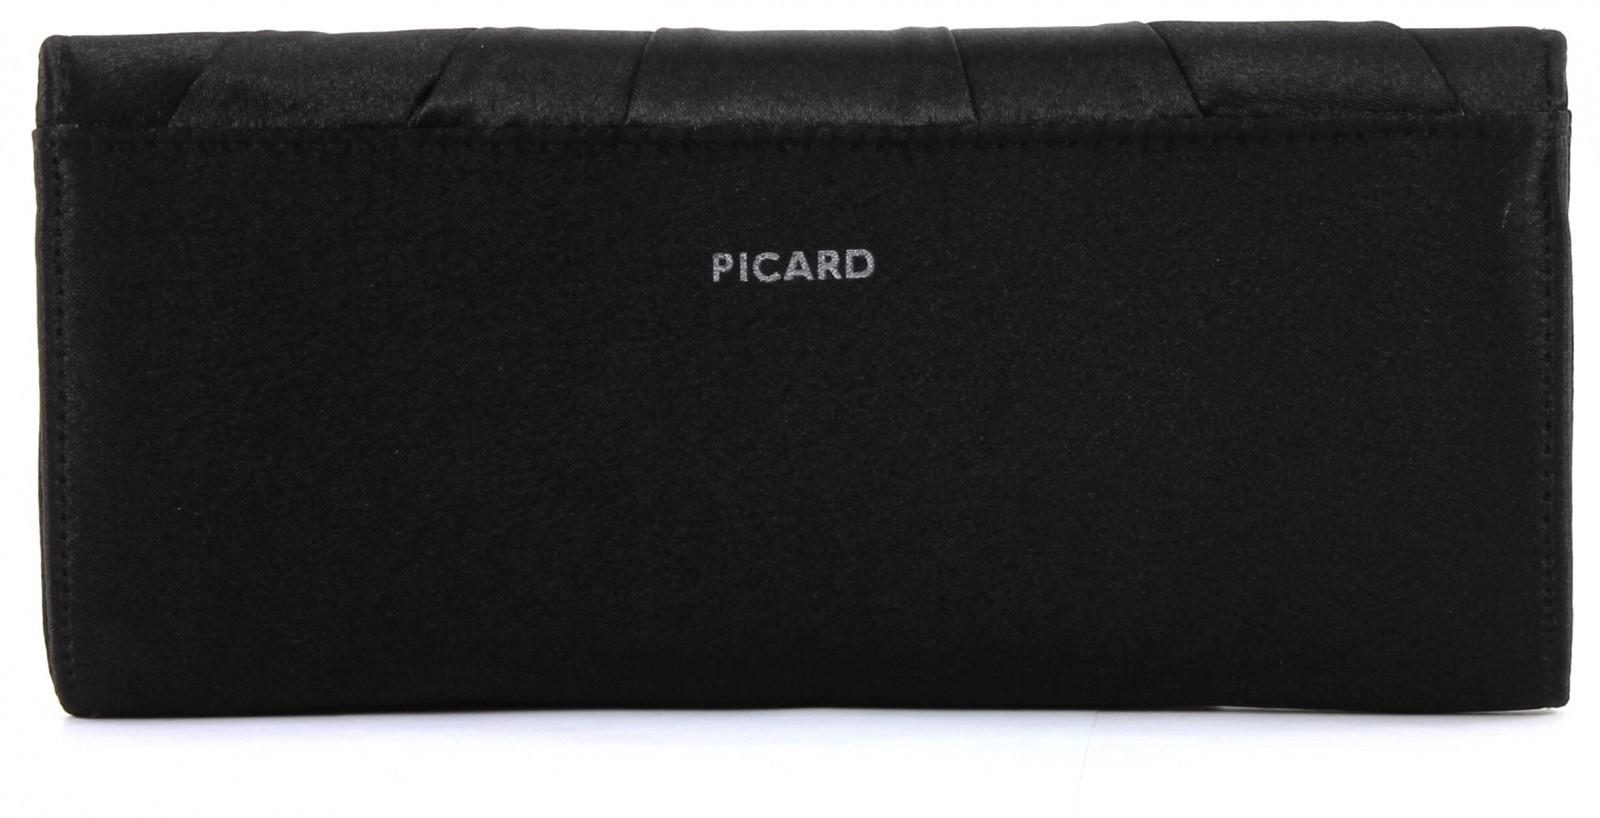 PICARD Scala Clutch Black